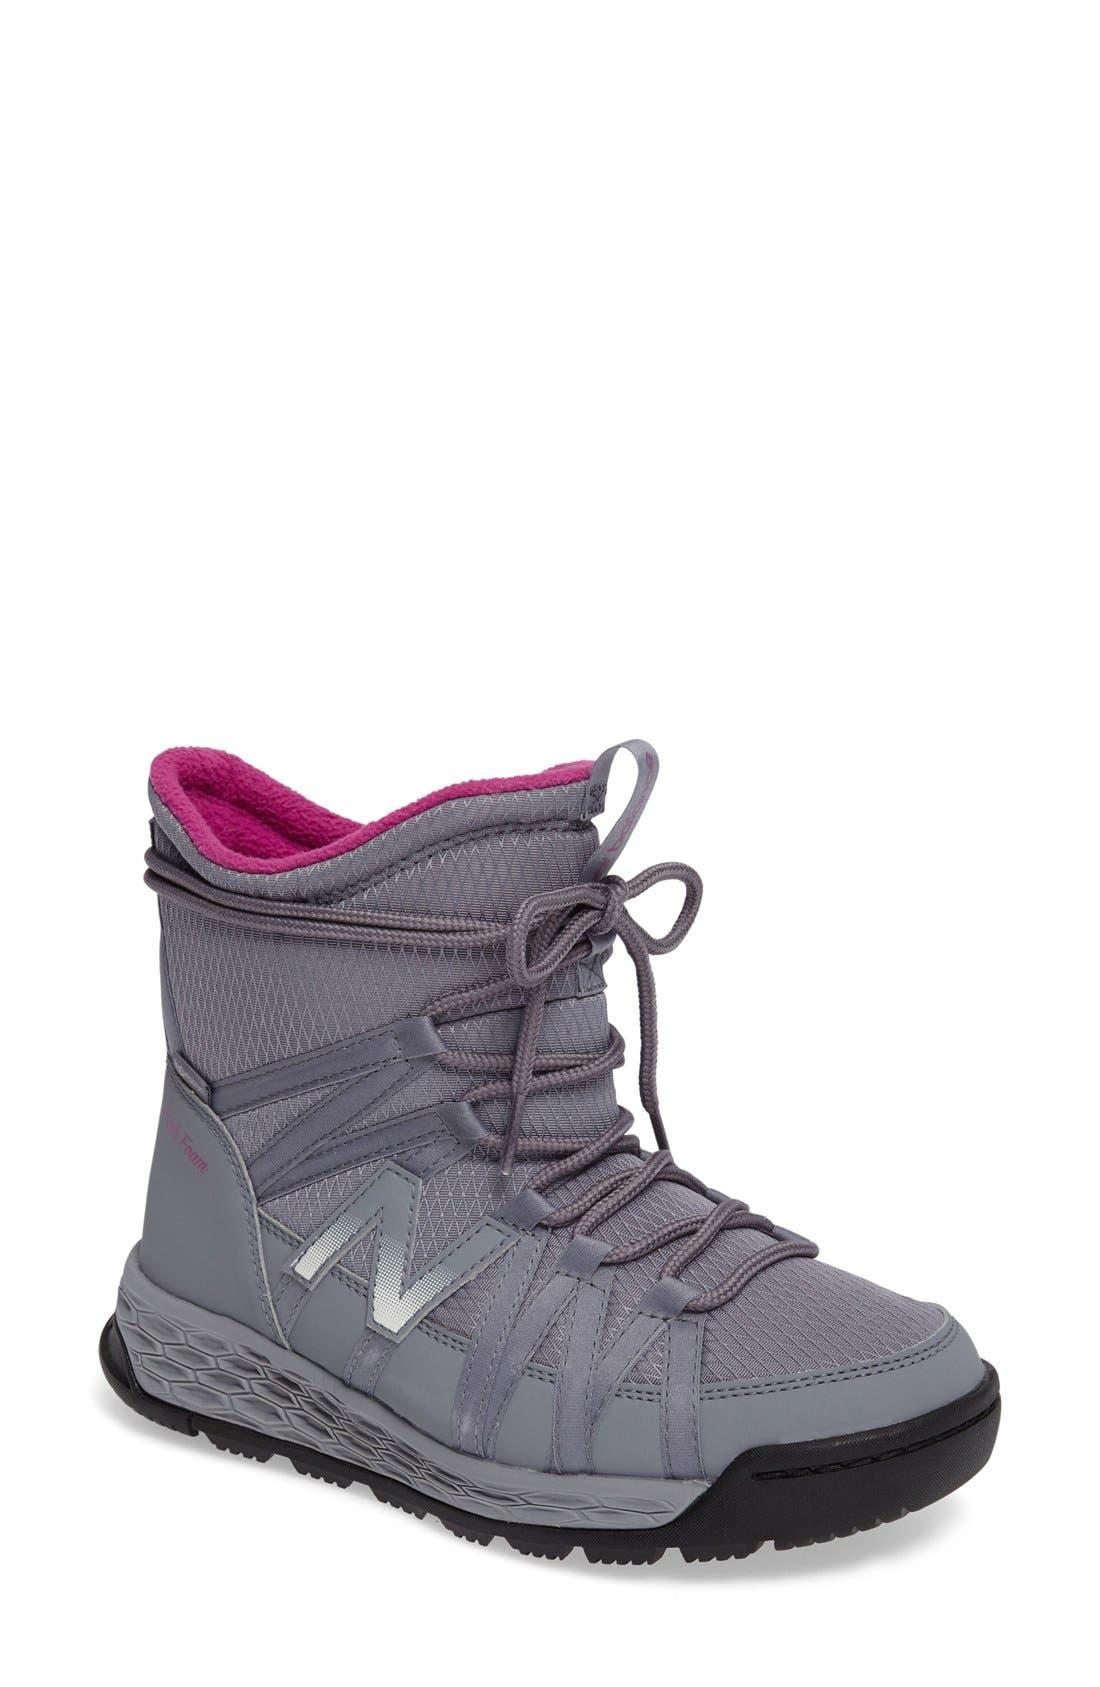 womens new balance boots